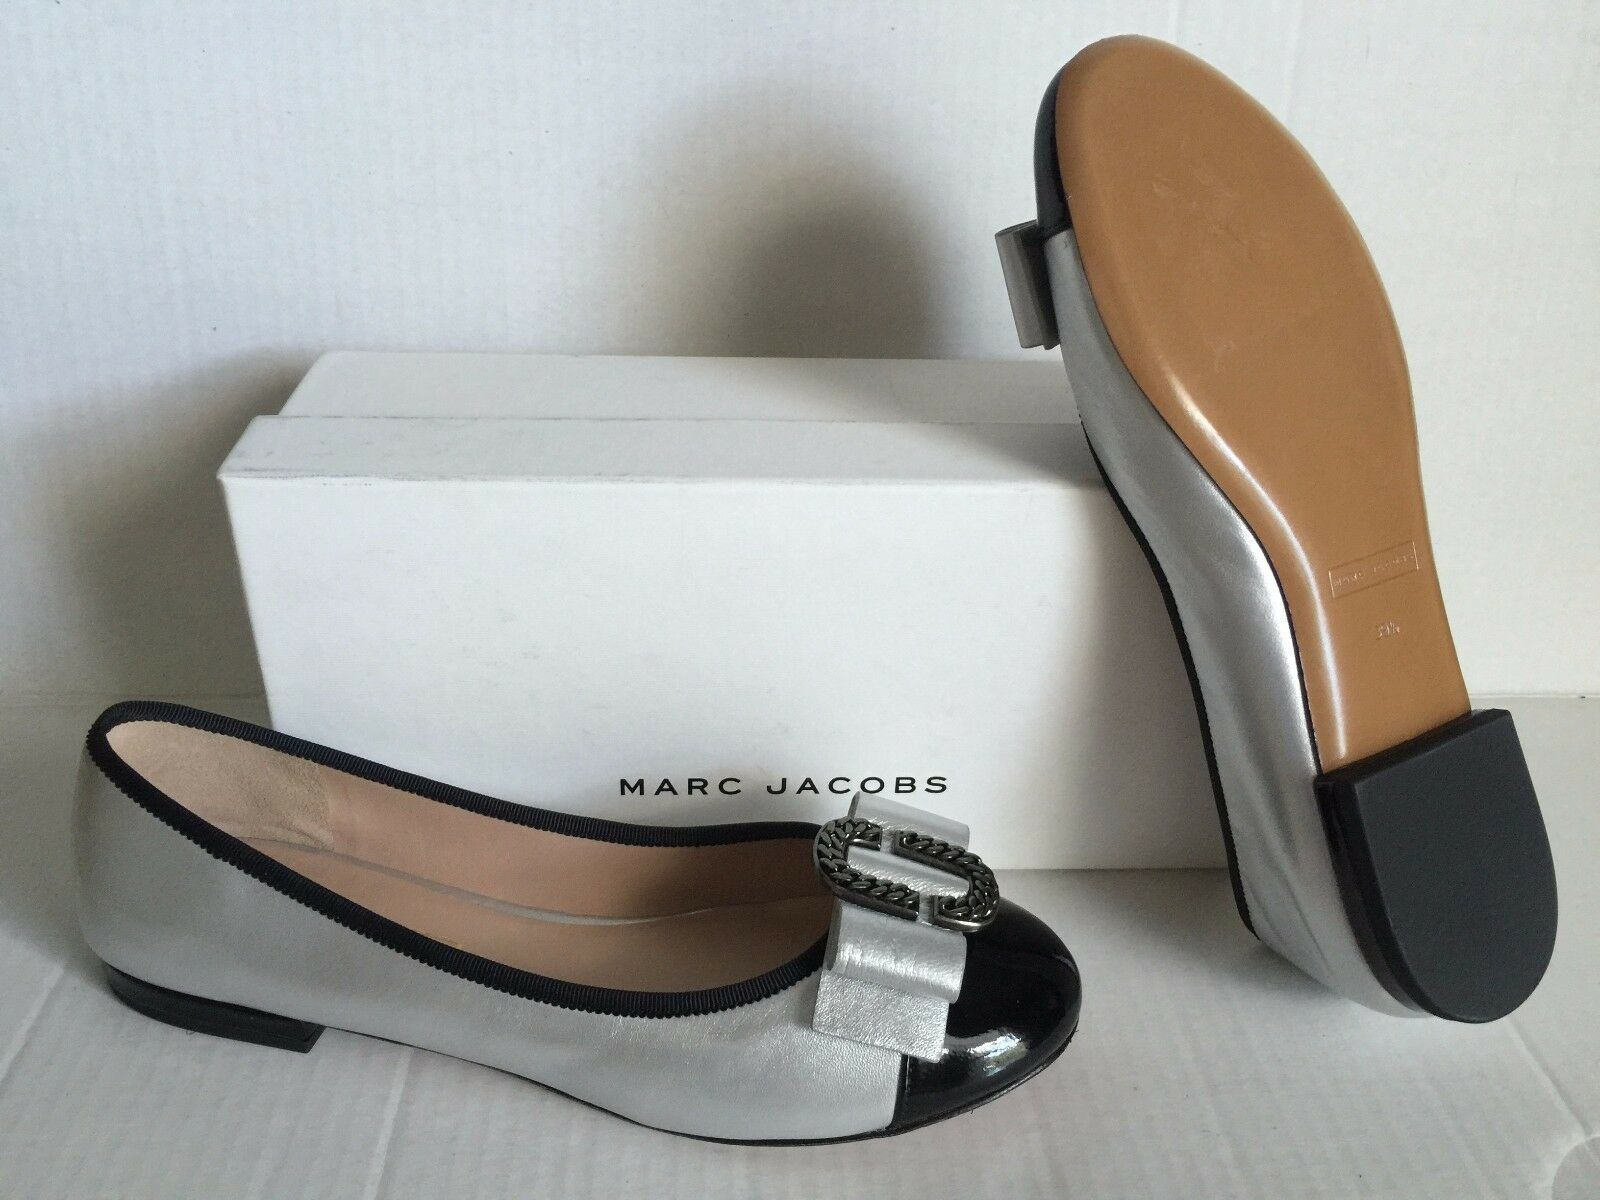 Marc Jacobs Silver Black Interlock Ballerina colorblock Flat Pumps 9.5